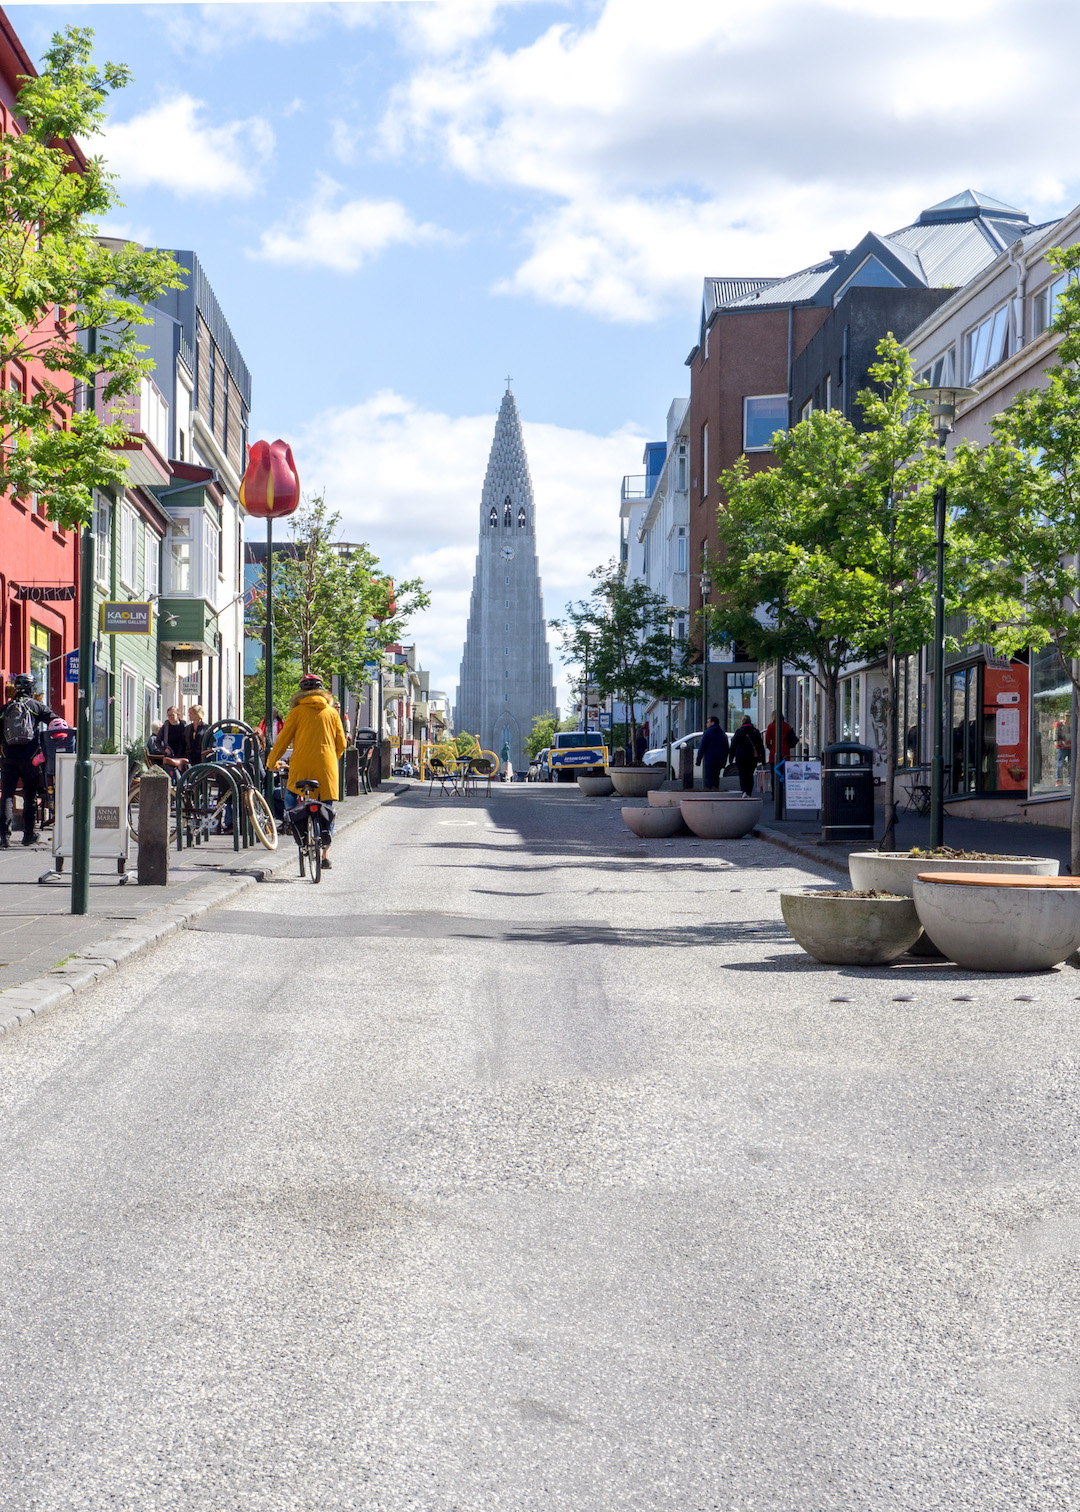 Her_Travel_Edit_Iceland_Reykjavik